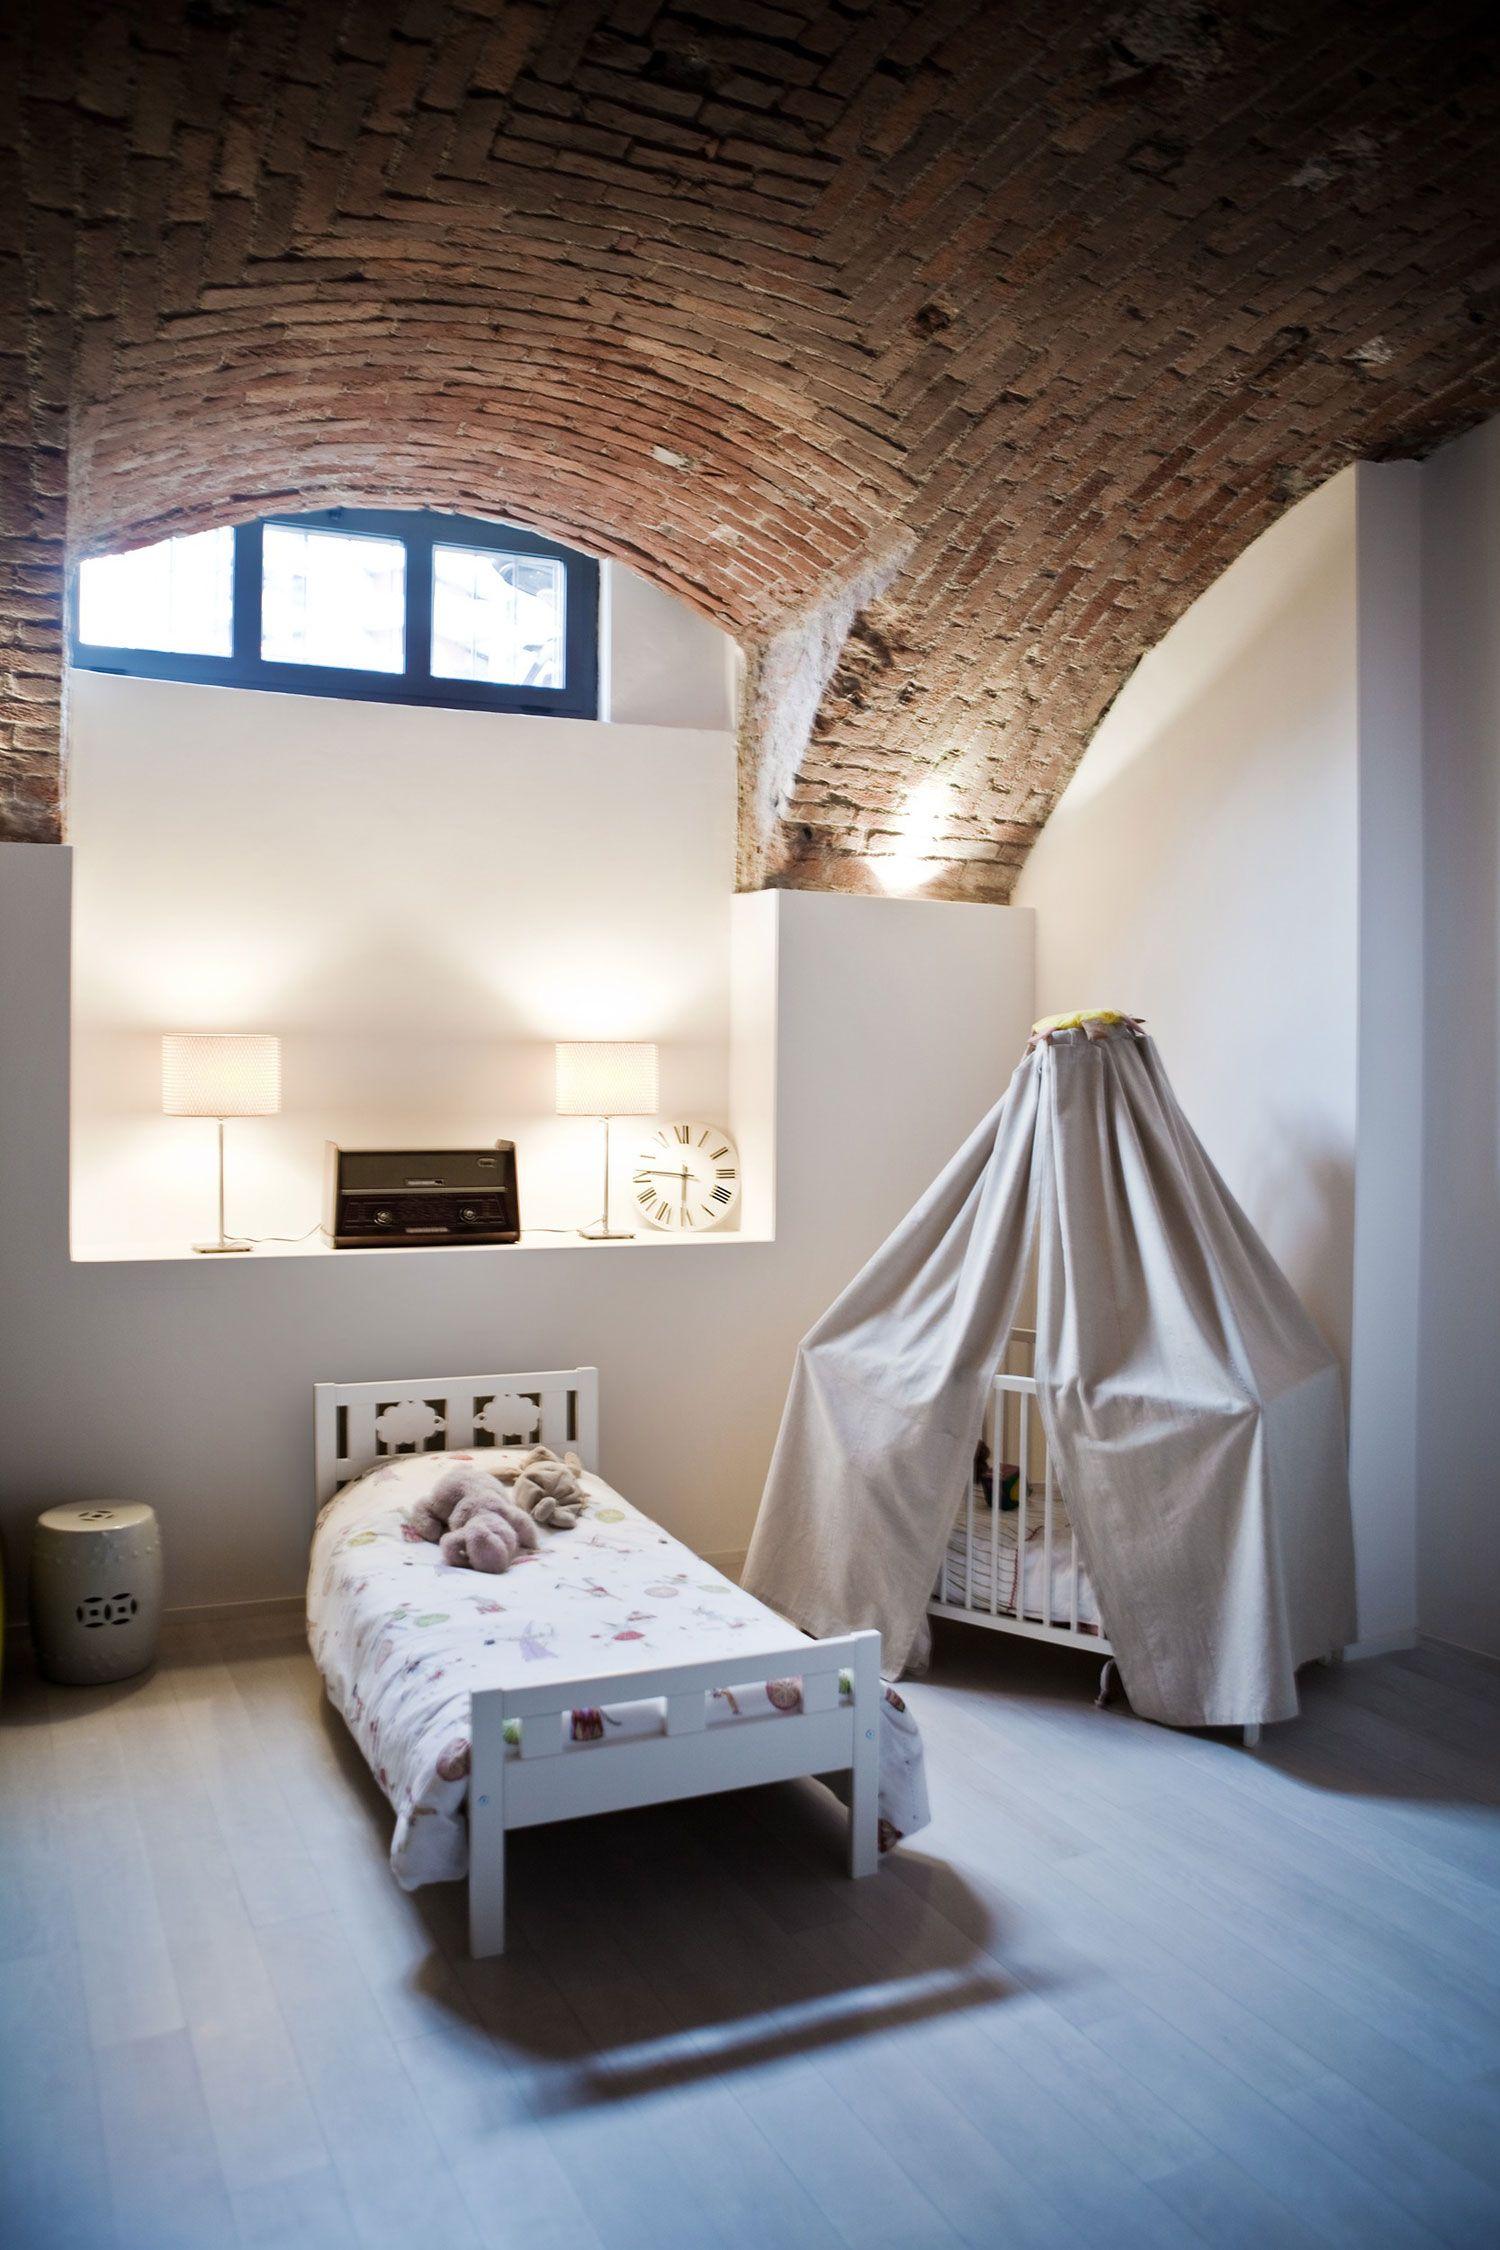 Loft space bedroom ideas  LOFT Milano by Frederic Gooris and Werner Silvestri  kidus space